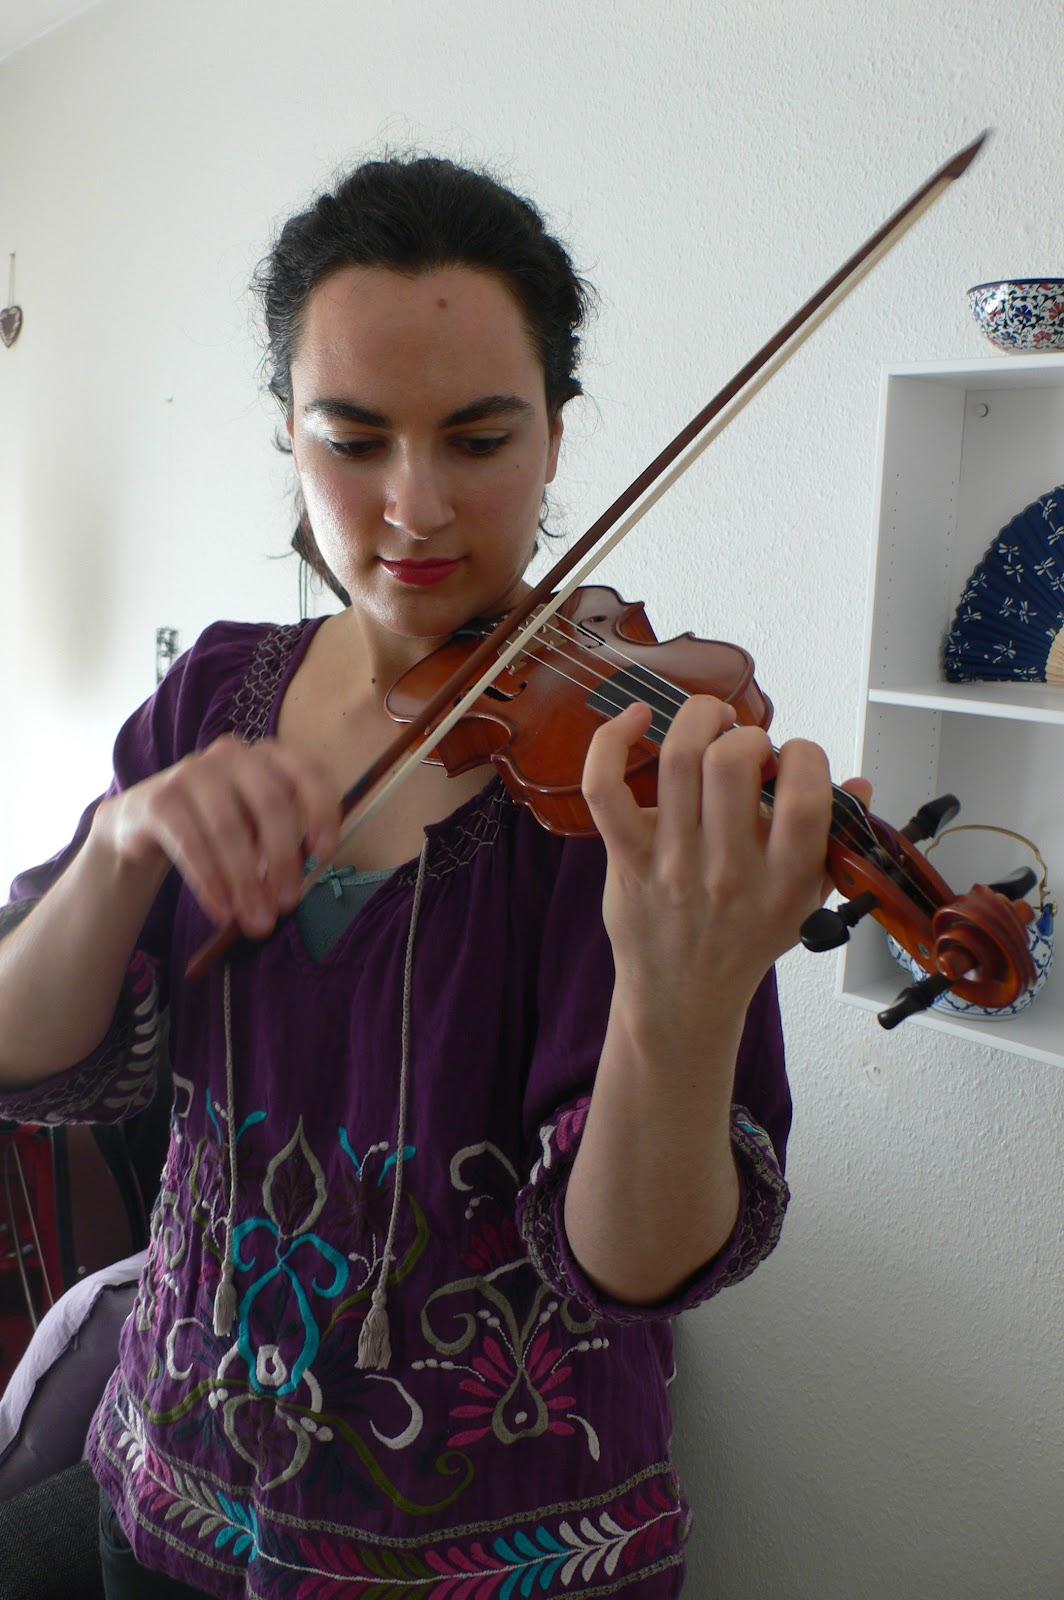 Scandinavian baroque blog maj 2012 - Volpino piccolo ...